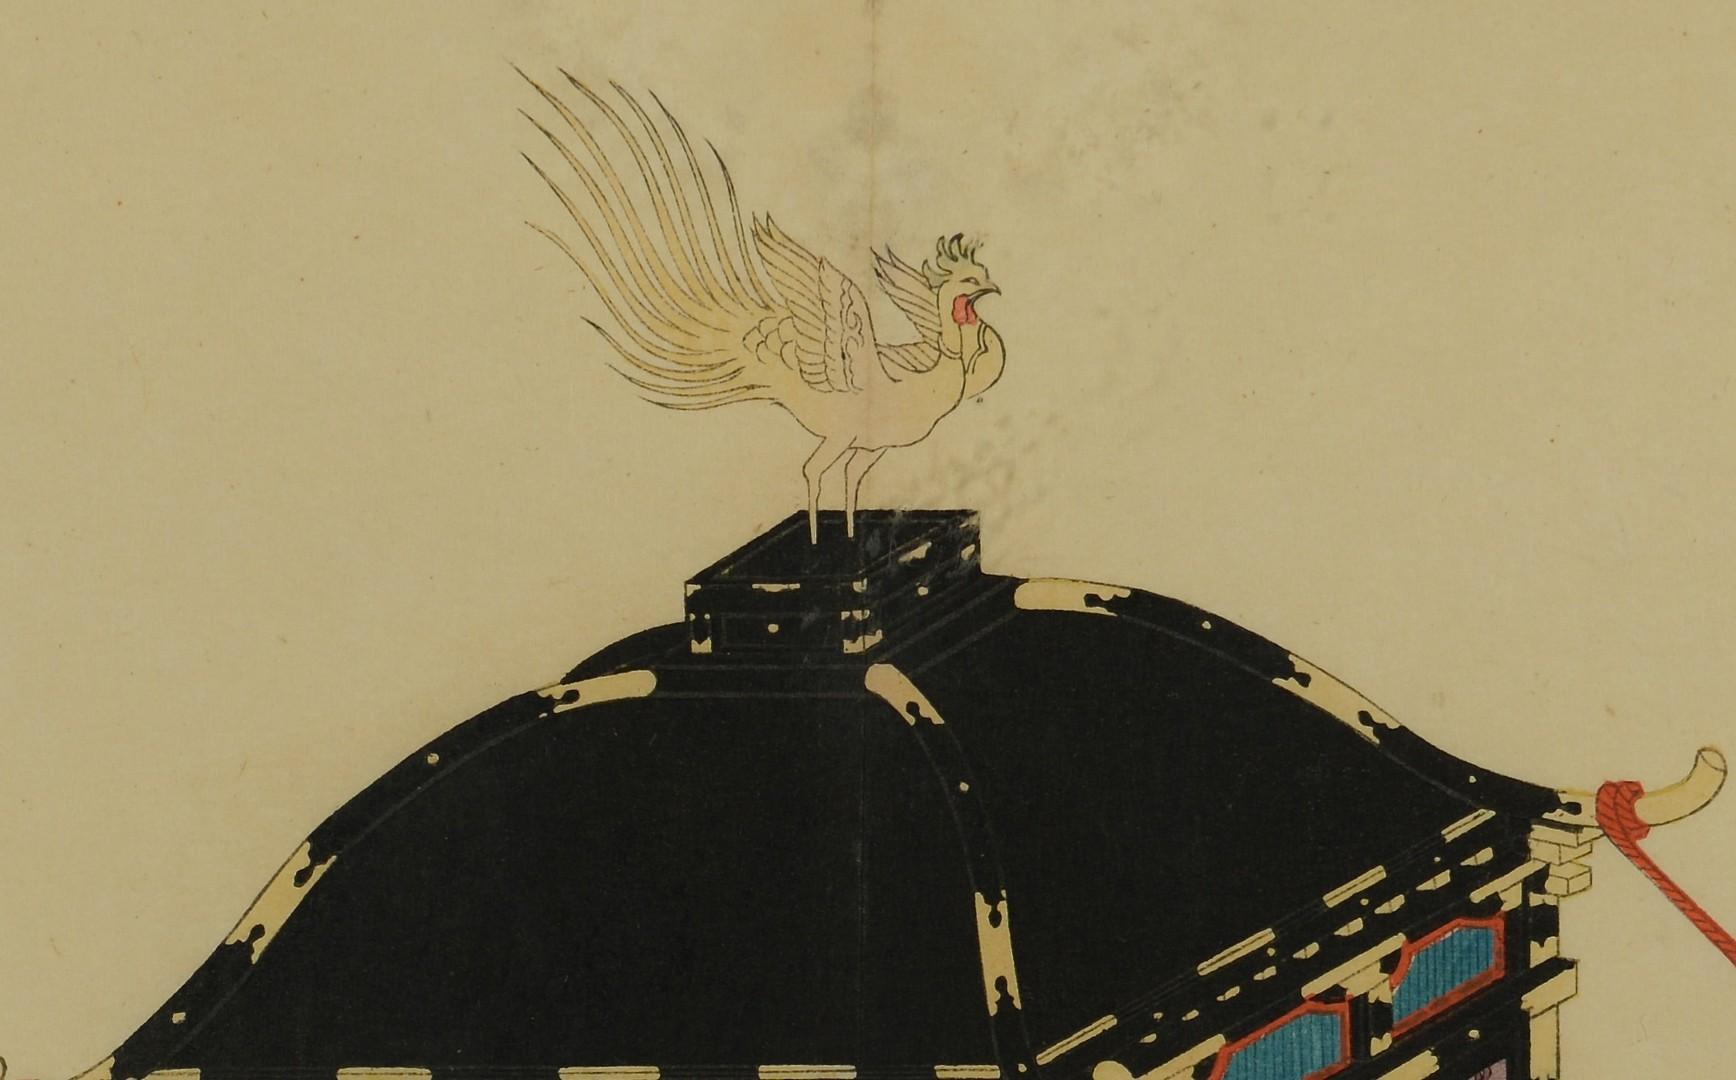 Lot 3594260: Japanese Gouache – Norimono or sedan chair